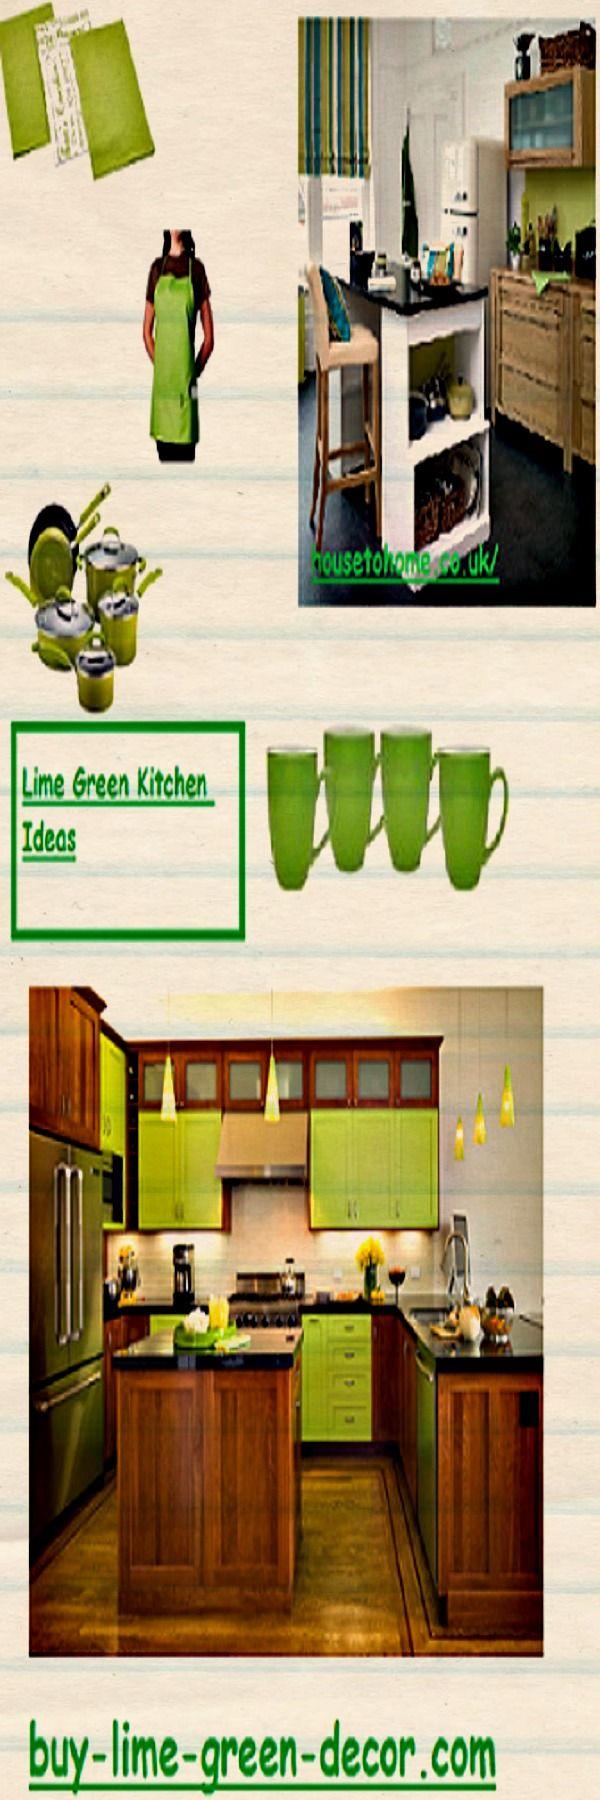 best 25 lime green kitchen ideas on pinterest green bath inspiration green kitchen paint. Black Bedroom Furniture Sets. Home Design Ideas